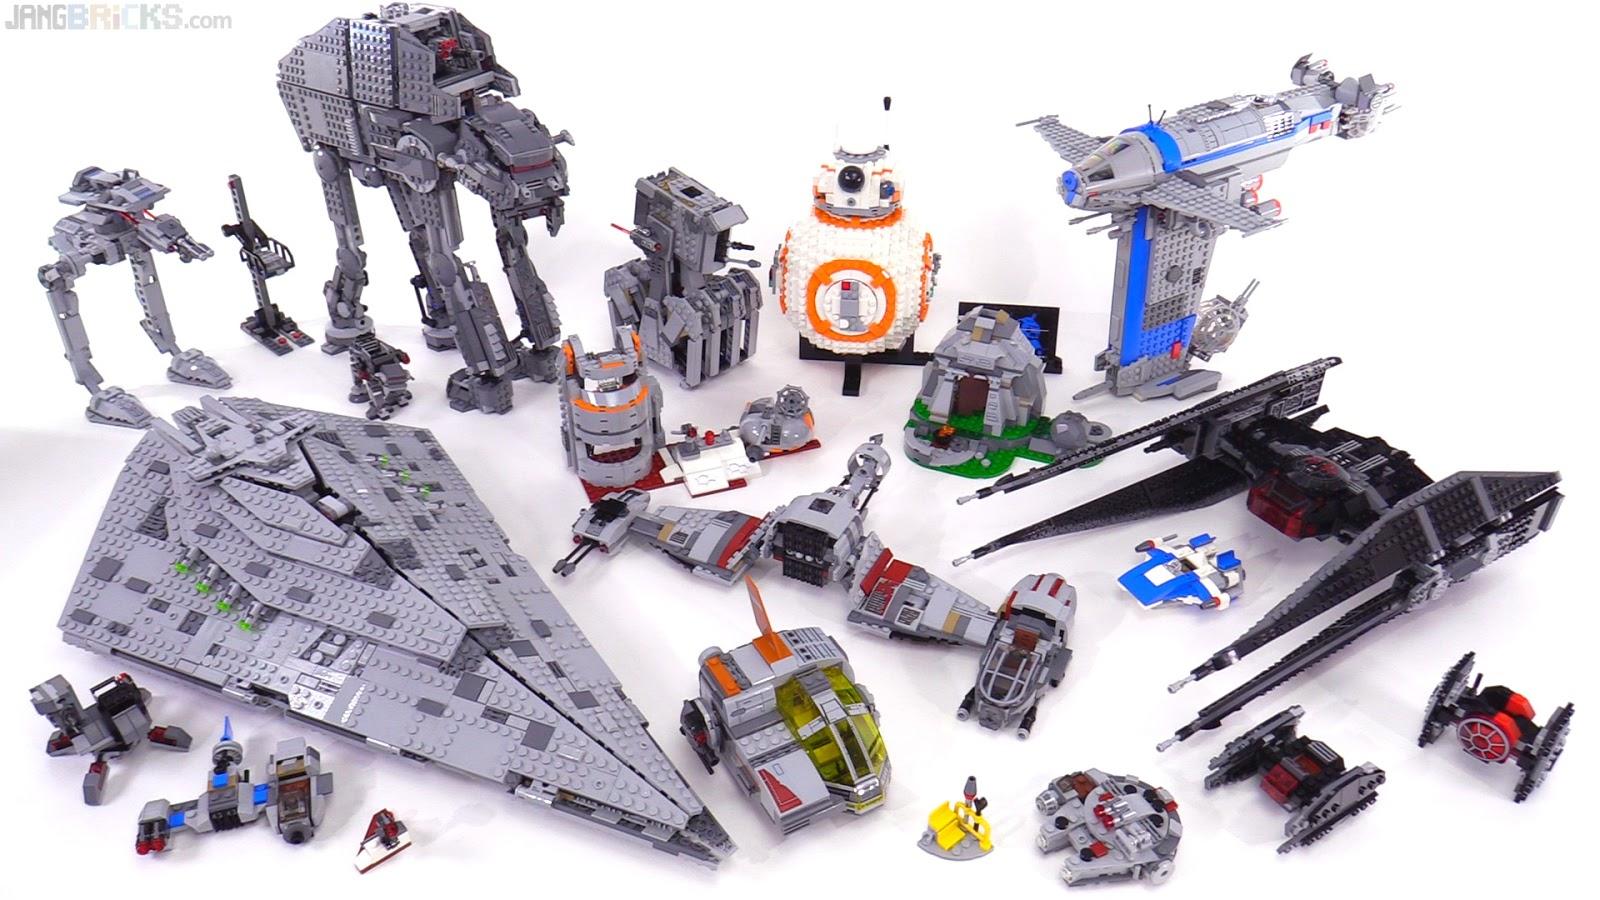 Star Wars The Last Jedi set collection summaries